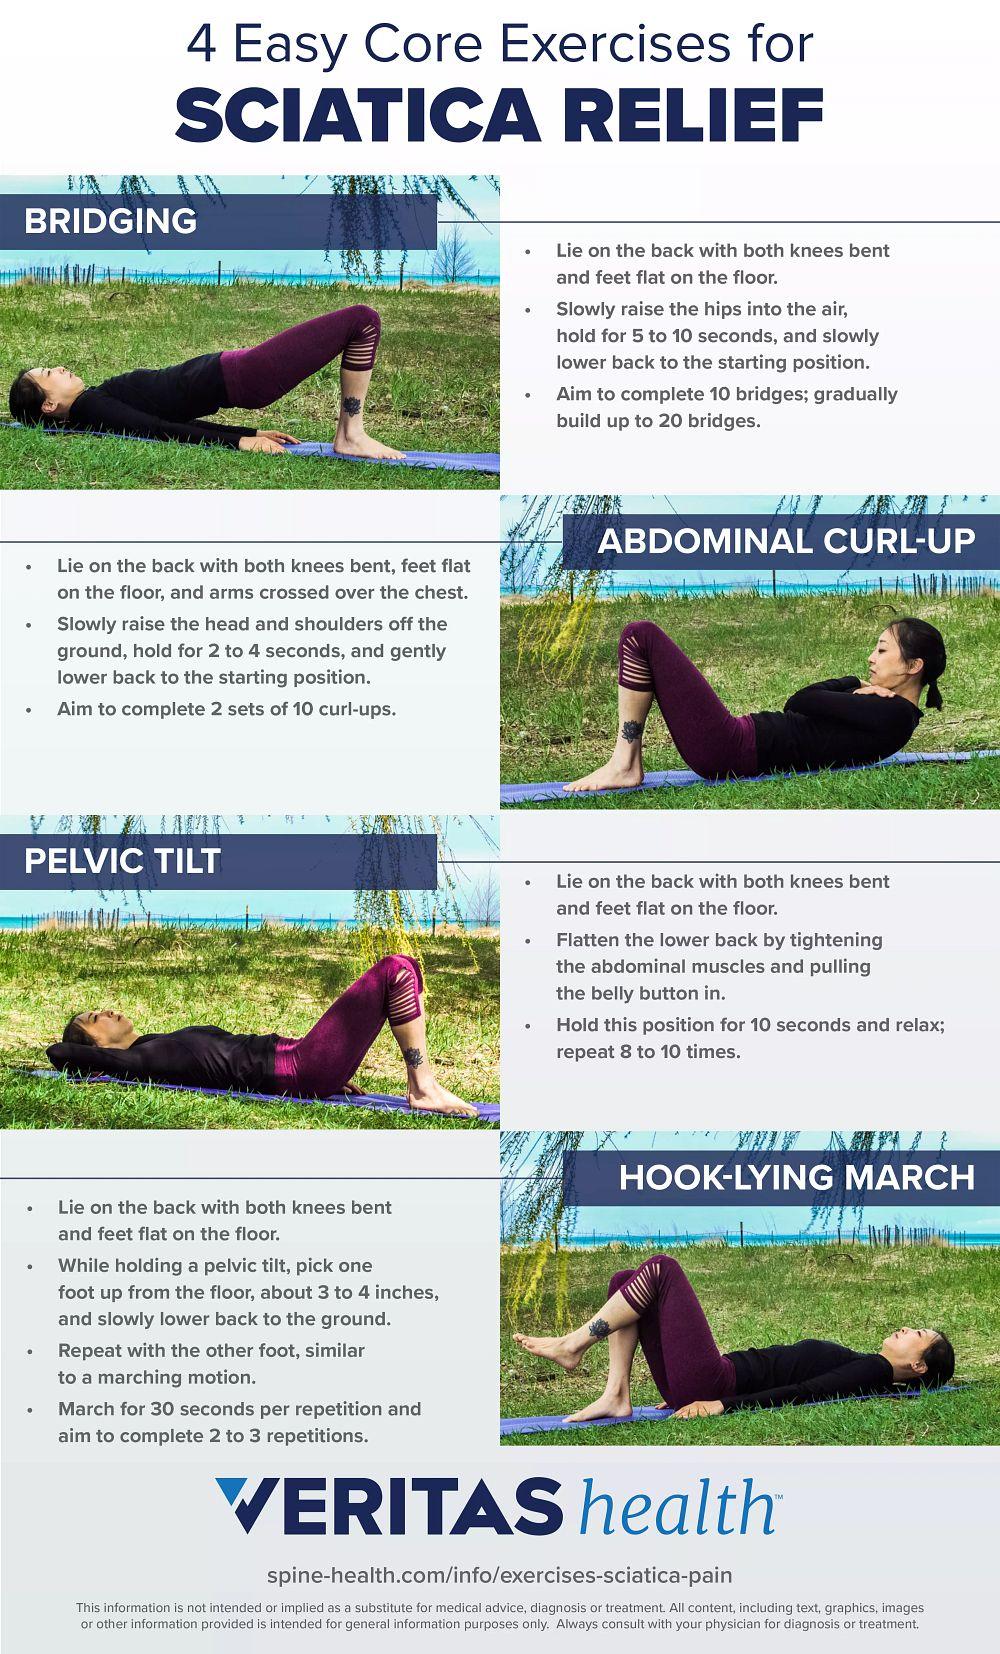 4 Easy Core Exercises for Sciatica Relief